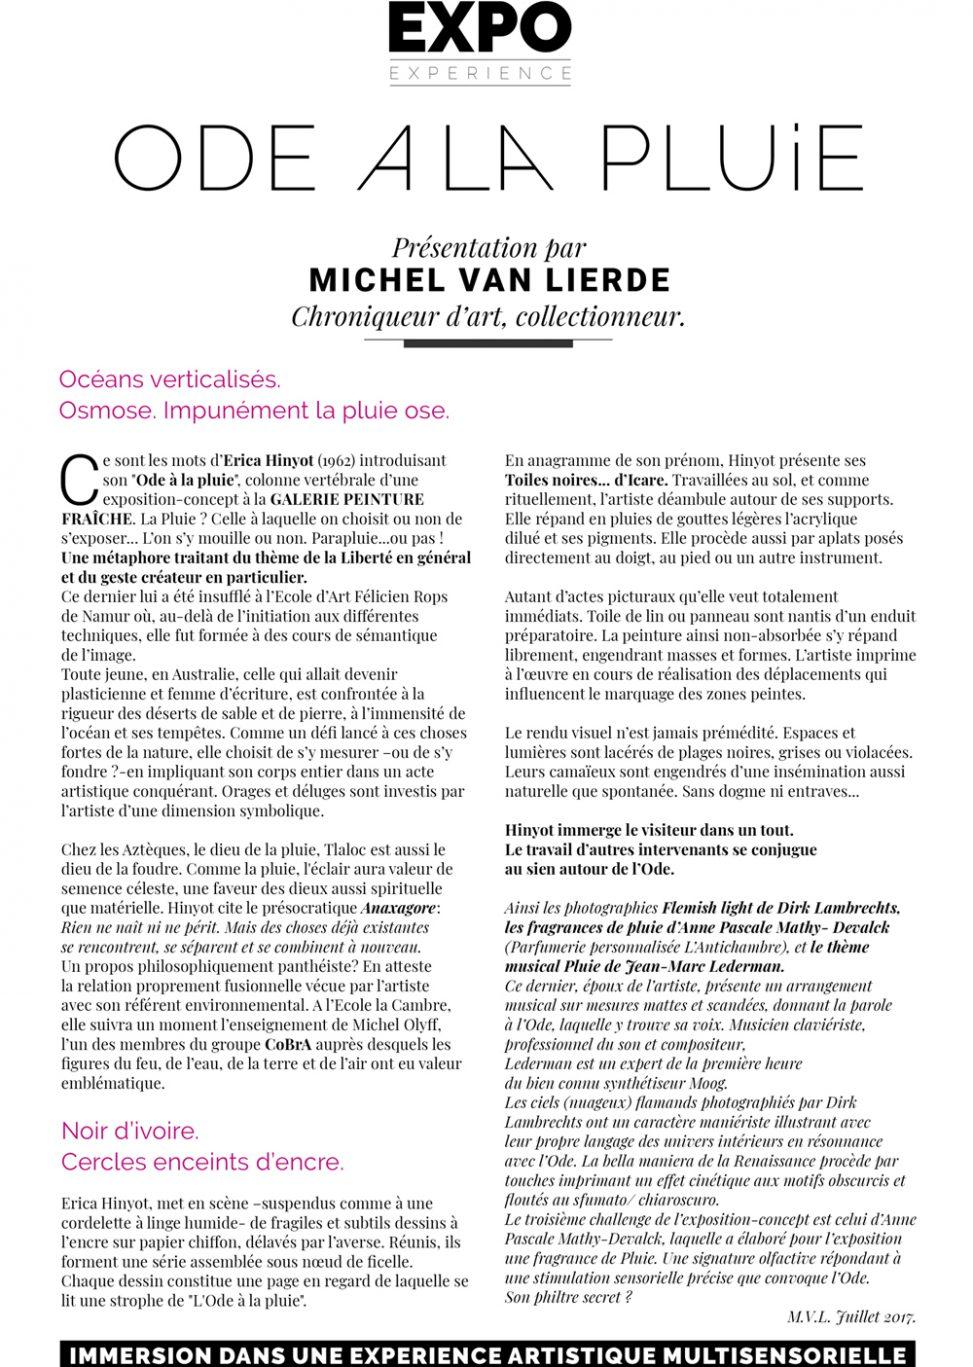 Text Michel Van Lierde collector art columnist exhibition Erica Hinyot - Freedom artistic act Cambre Cobra - Anaxagore